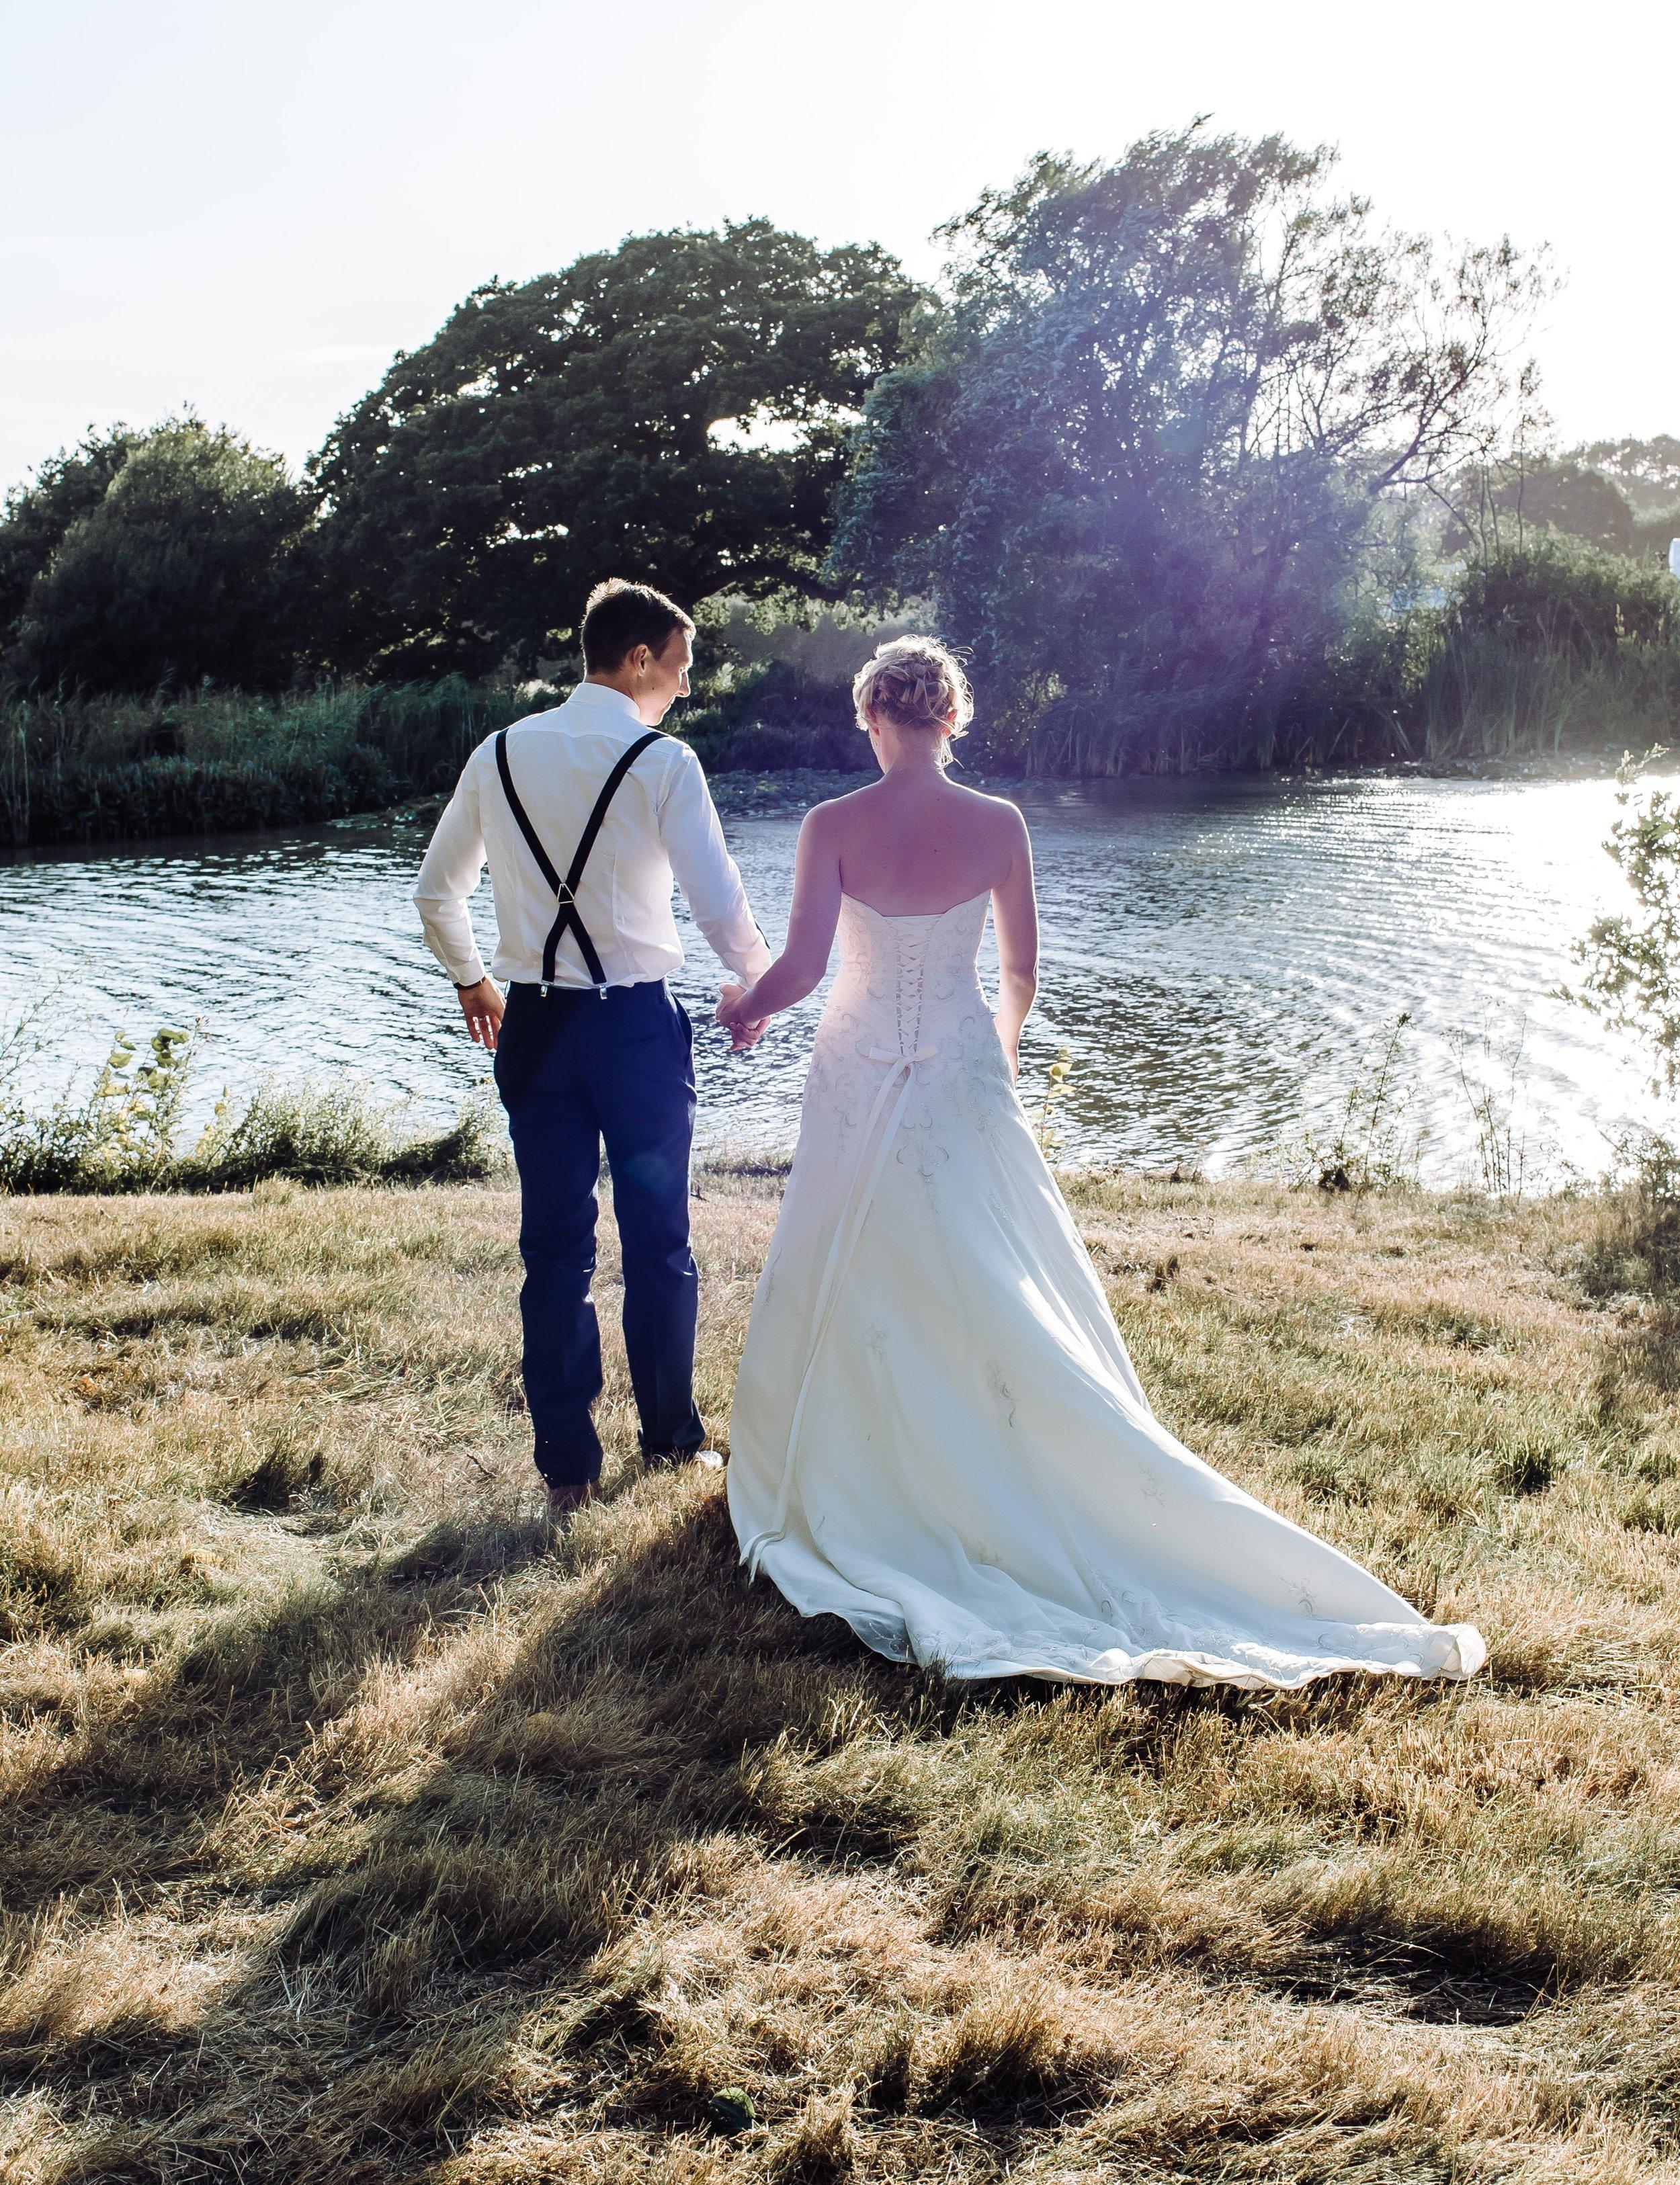 Vintage Wedding - East Sussex Wedding Photographer_0037.jpg